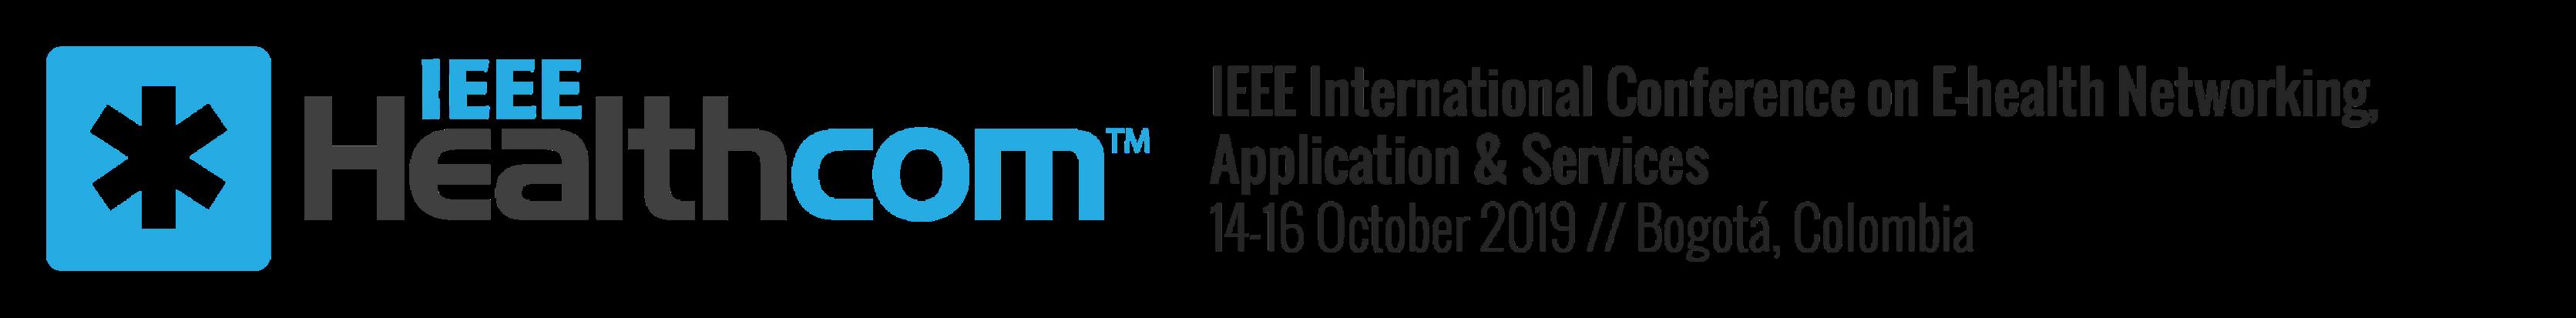 IEEE Healthcom 2019  (Healthcom)